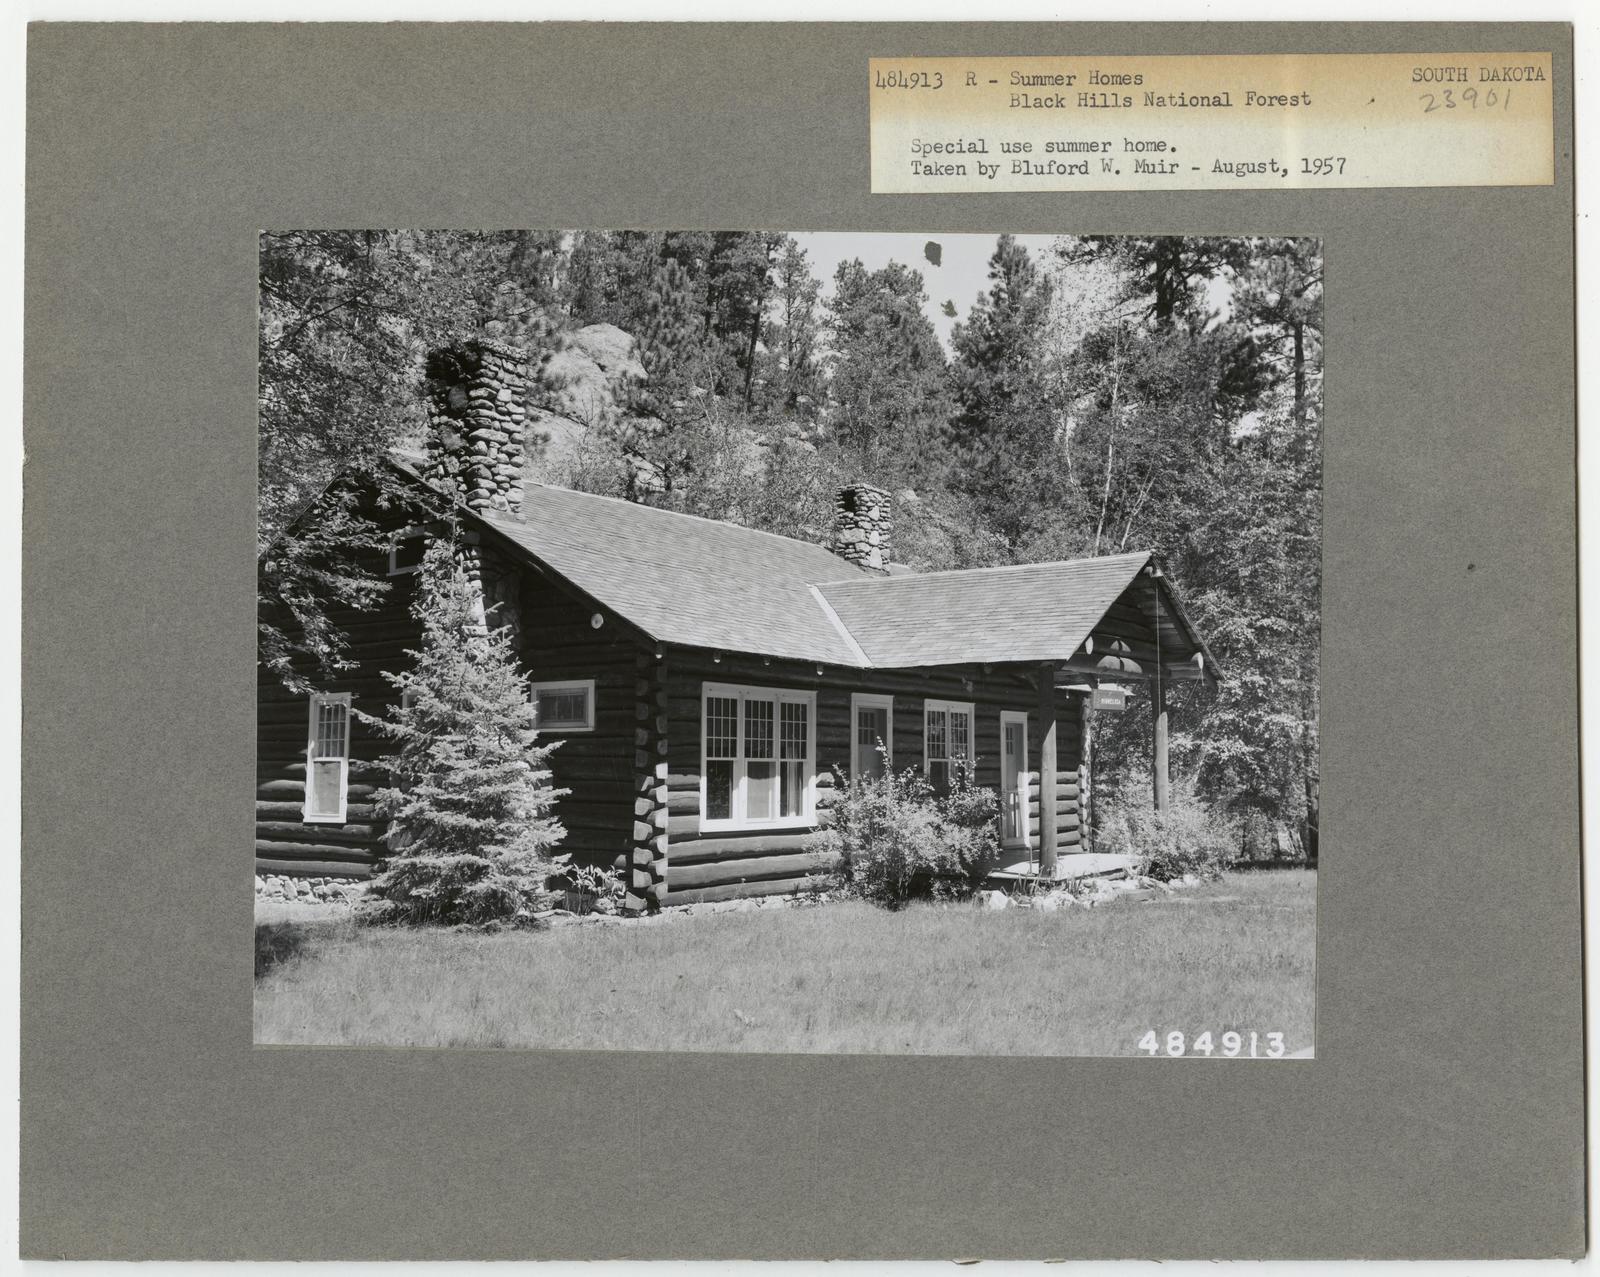 Resorts and Other Dwellings - South Dakota